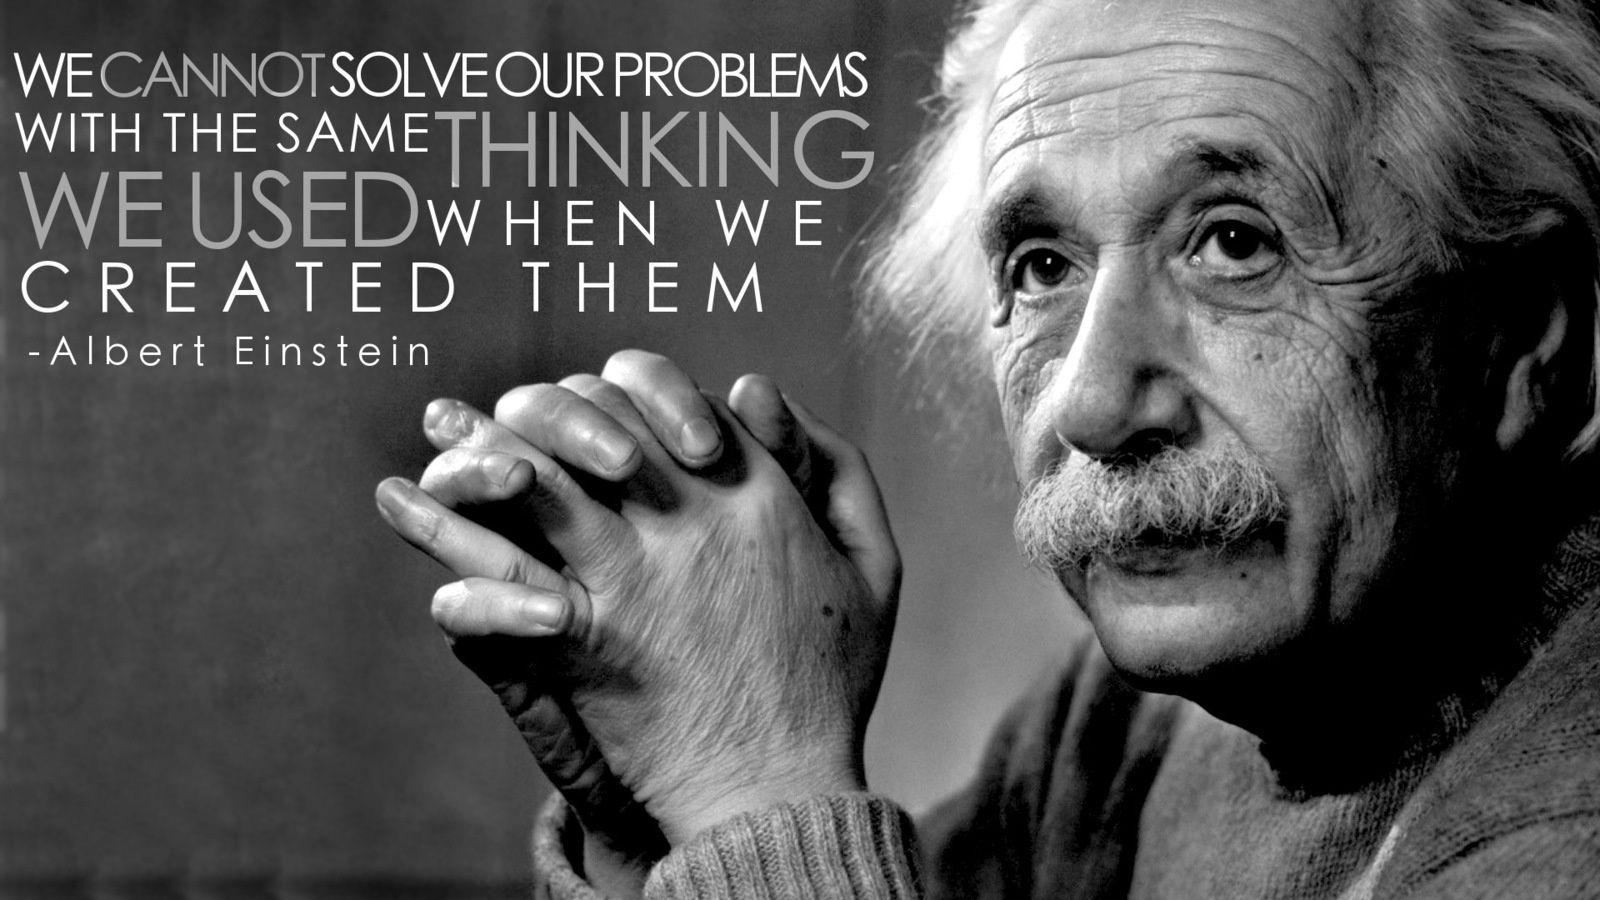 Afbeeldingsresultaat voor einstein quotes you cannot solve a problem